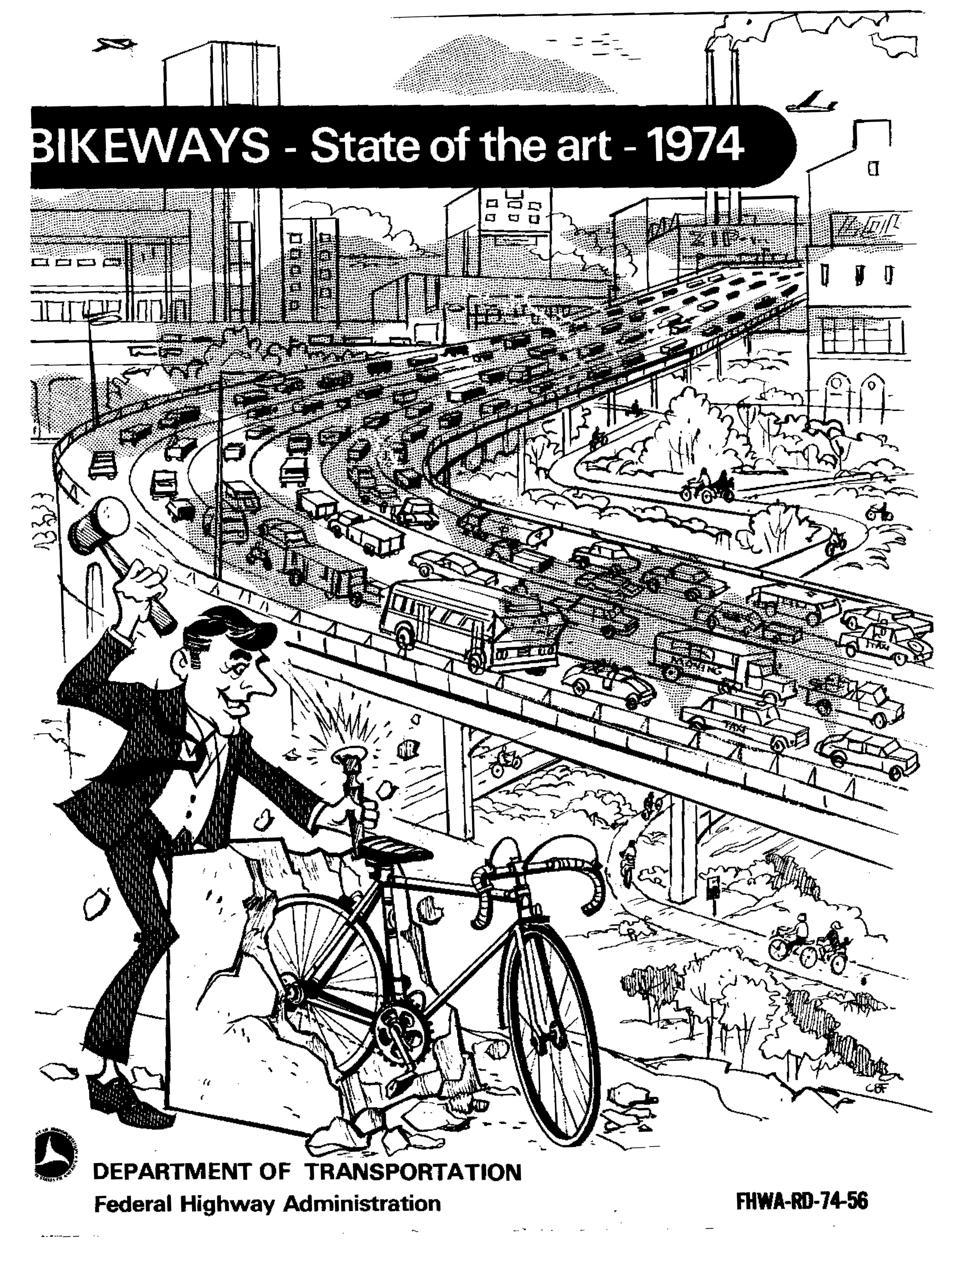 Bikeways—State of the Art, 1974